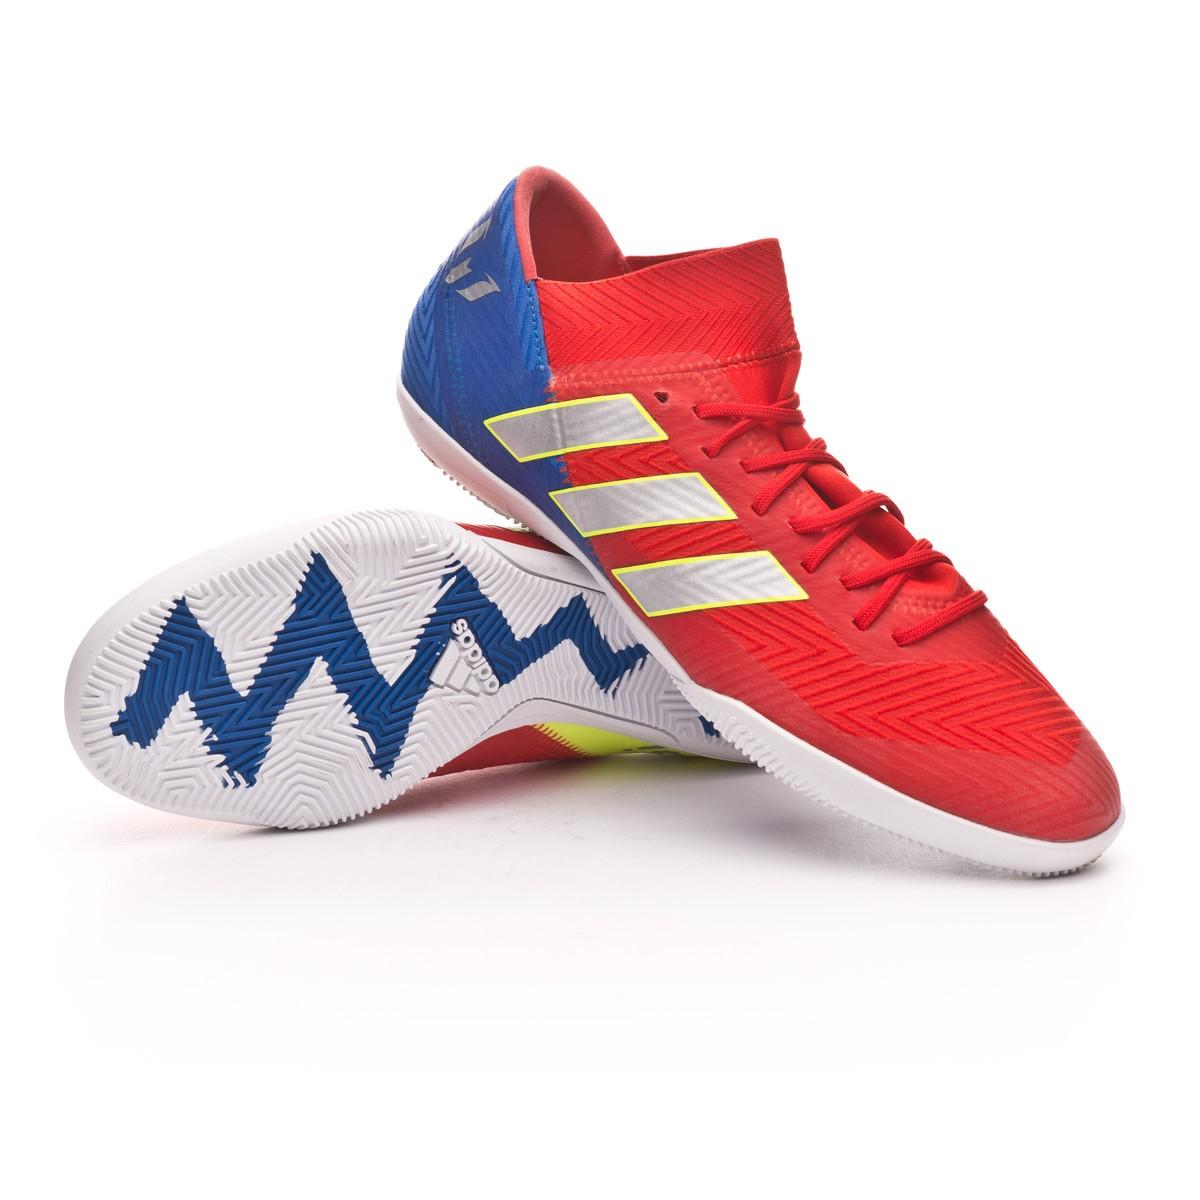 envío gratis bueno tiendas populares adidas Nemeziz Messi Tango 18.3 IN Futsal Boot